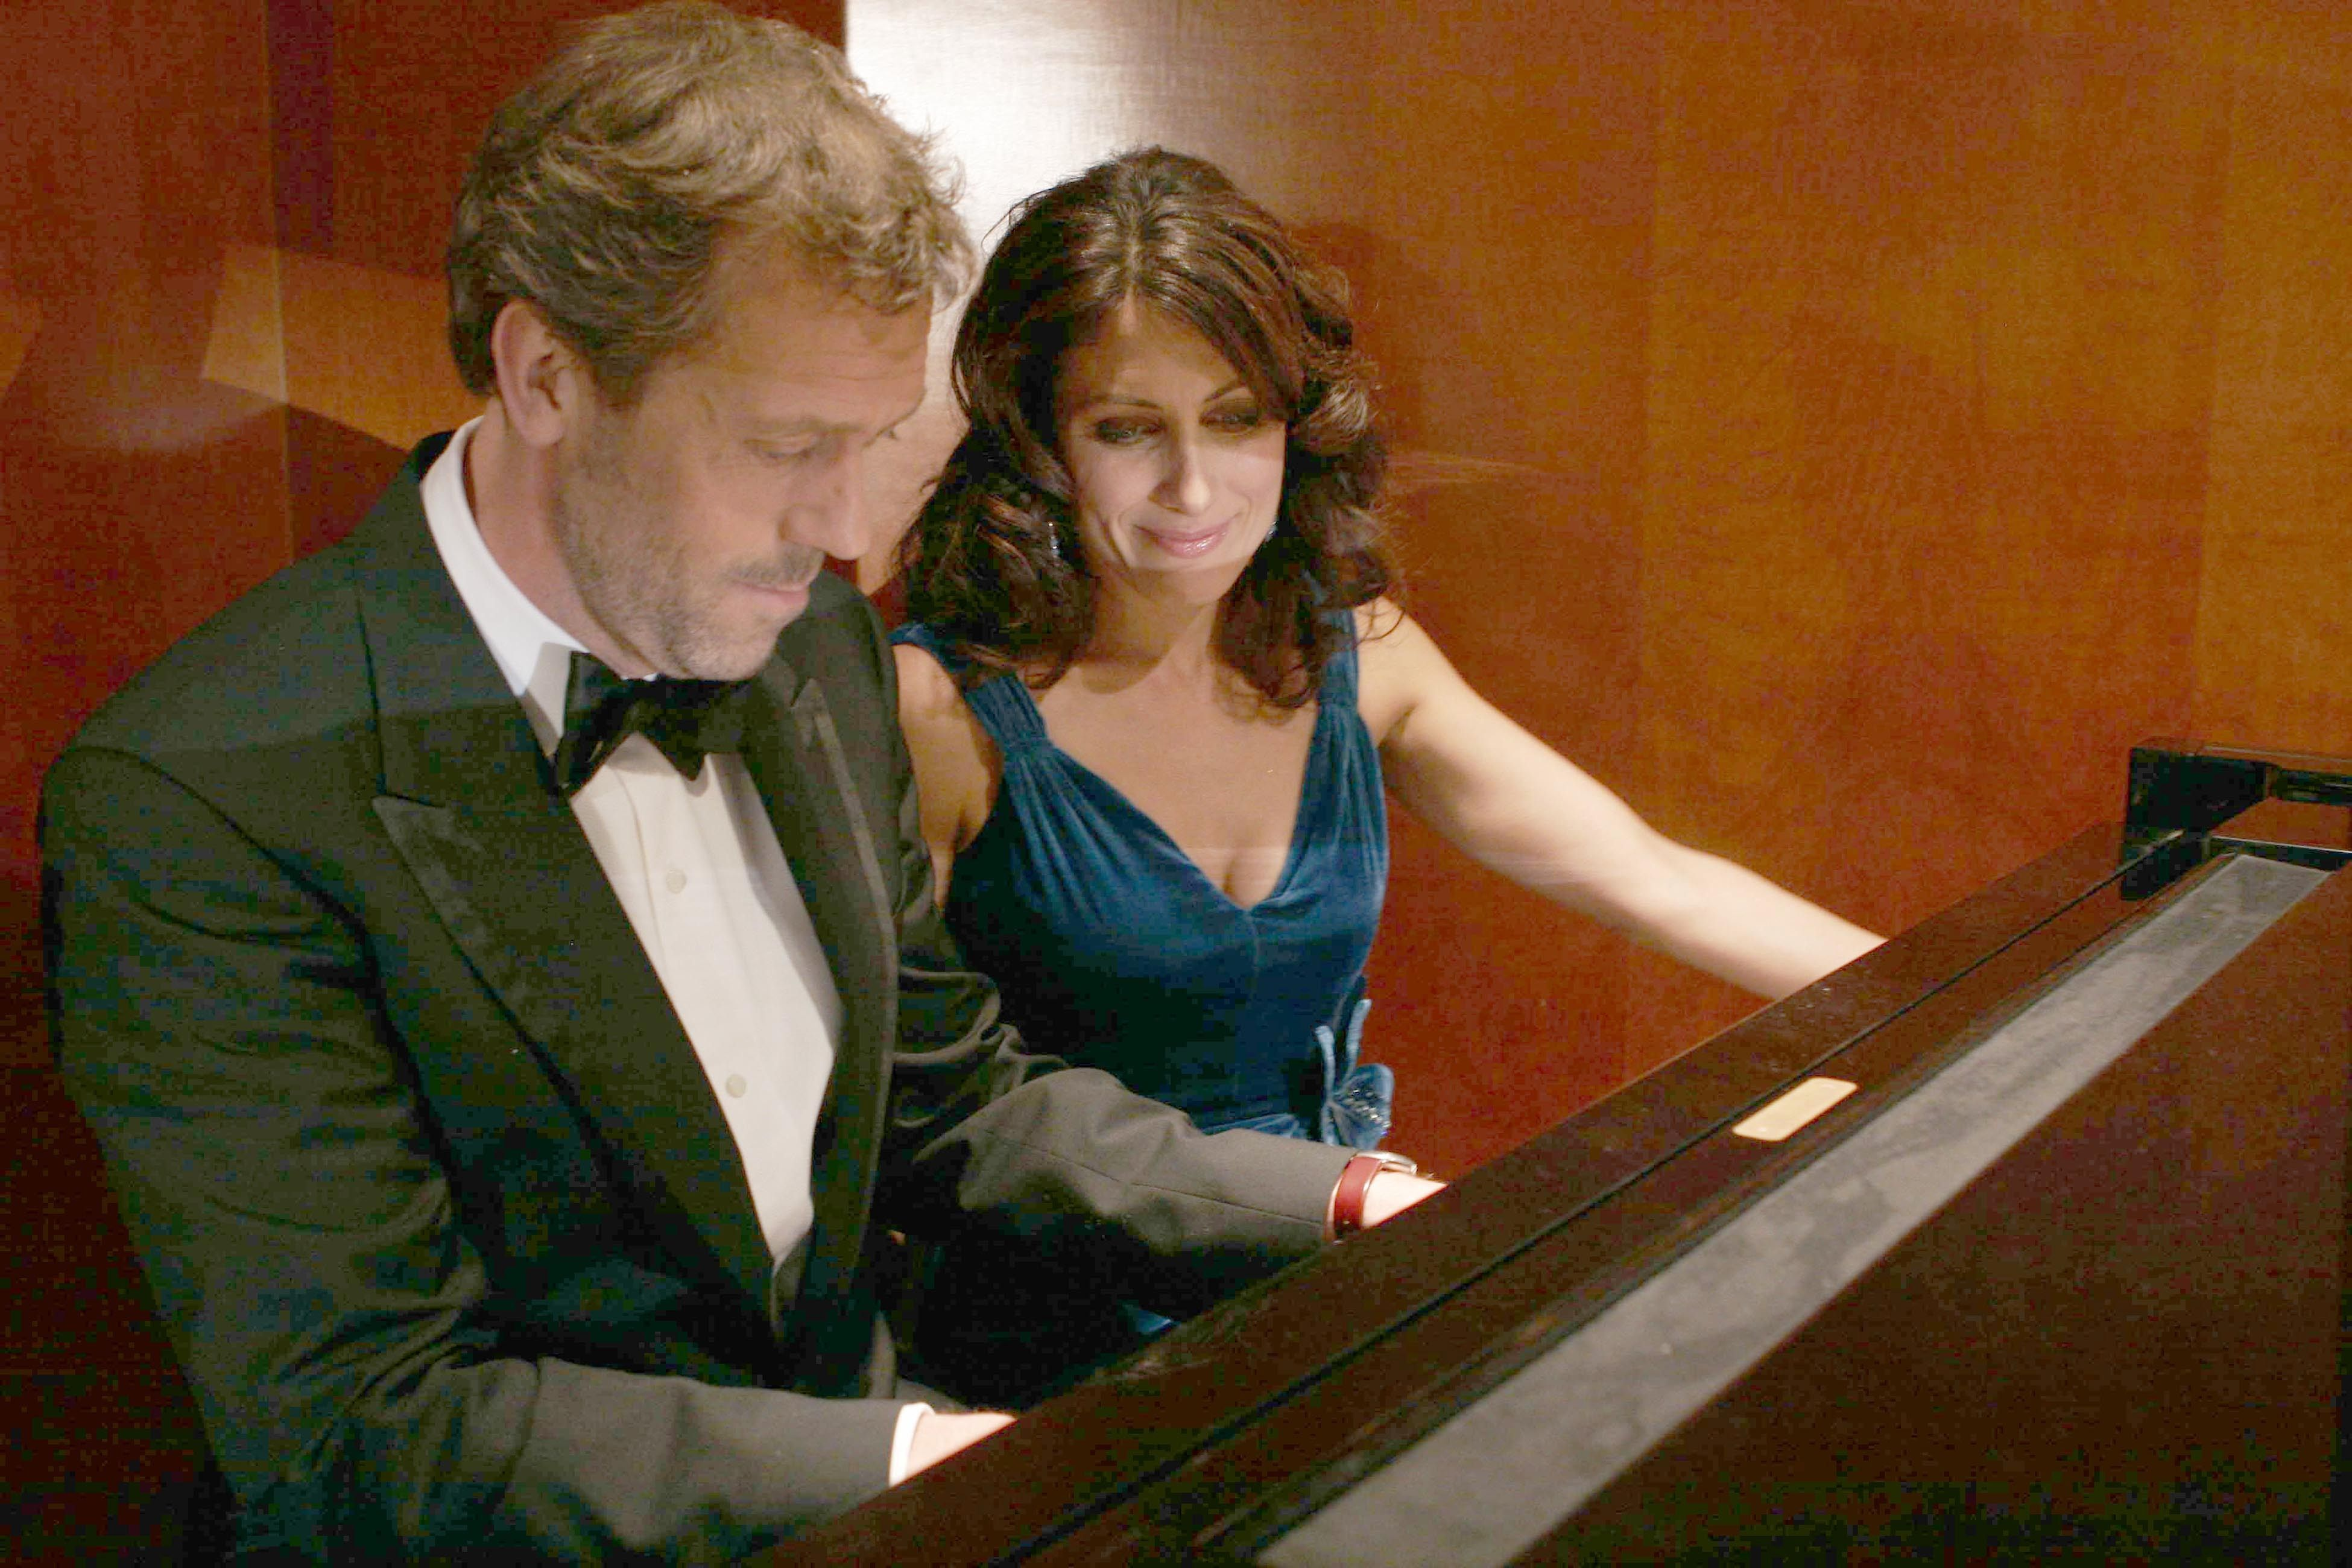 House - Season 2 Episode 17 Still | Hugh Laurie | Gregory